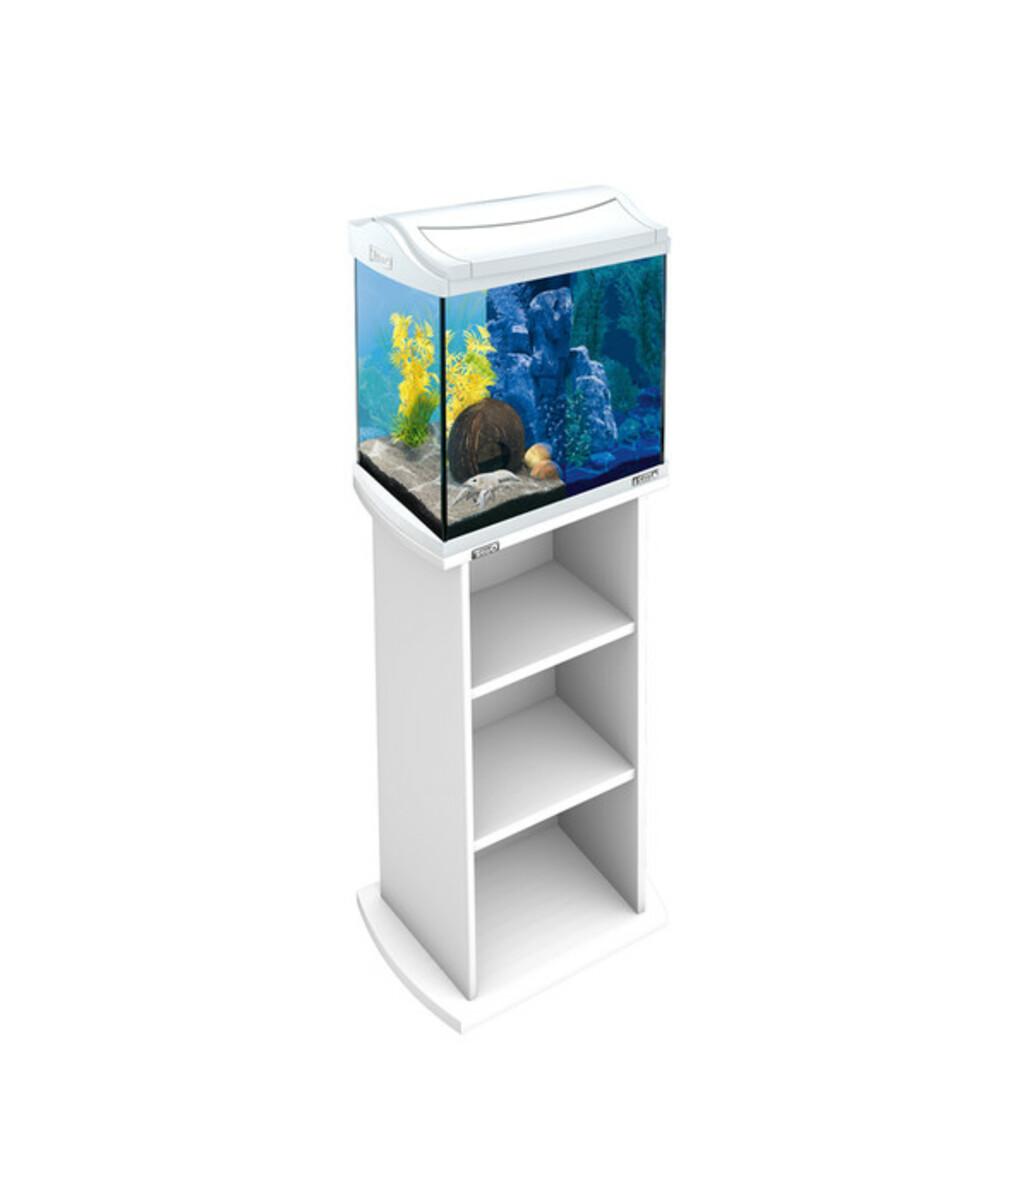 Bild 2 von Tetra AquaArt Aquarienunterschrank 20/30 l, weiß